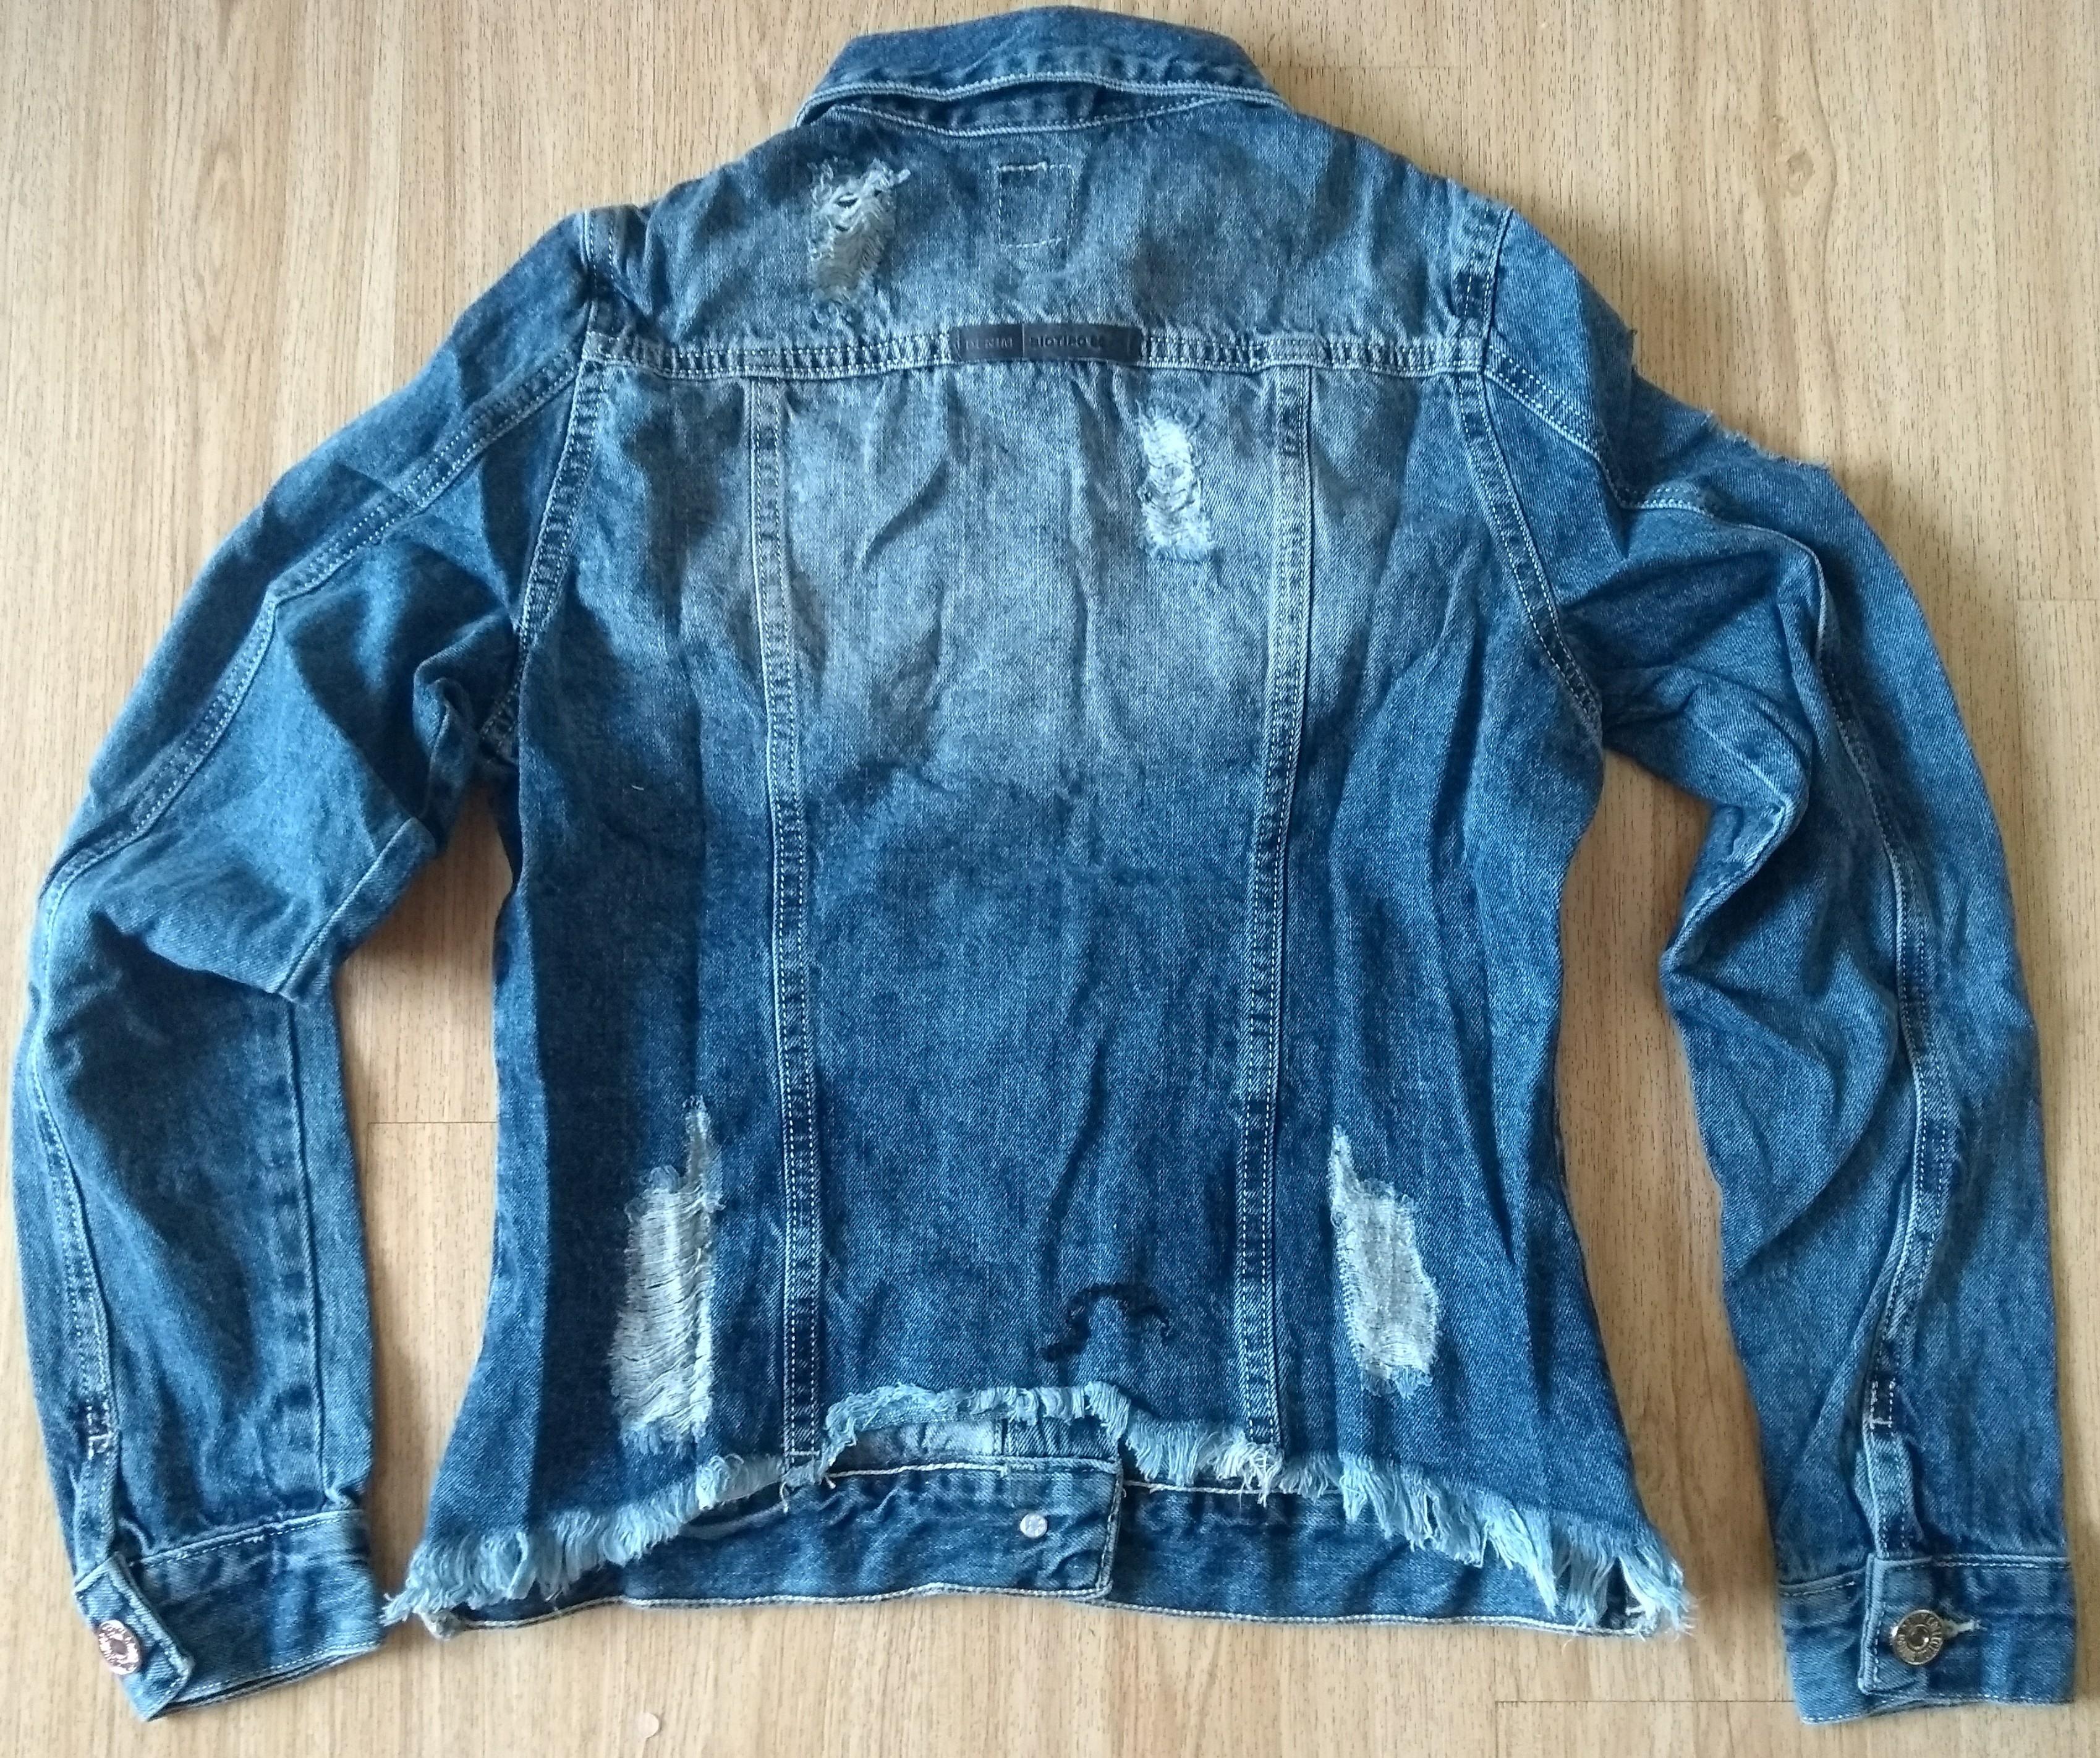 1c49a7bf09 Jaqueta Jeans Feminina Biotipo Destroyed no Elo7